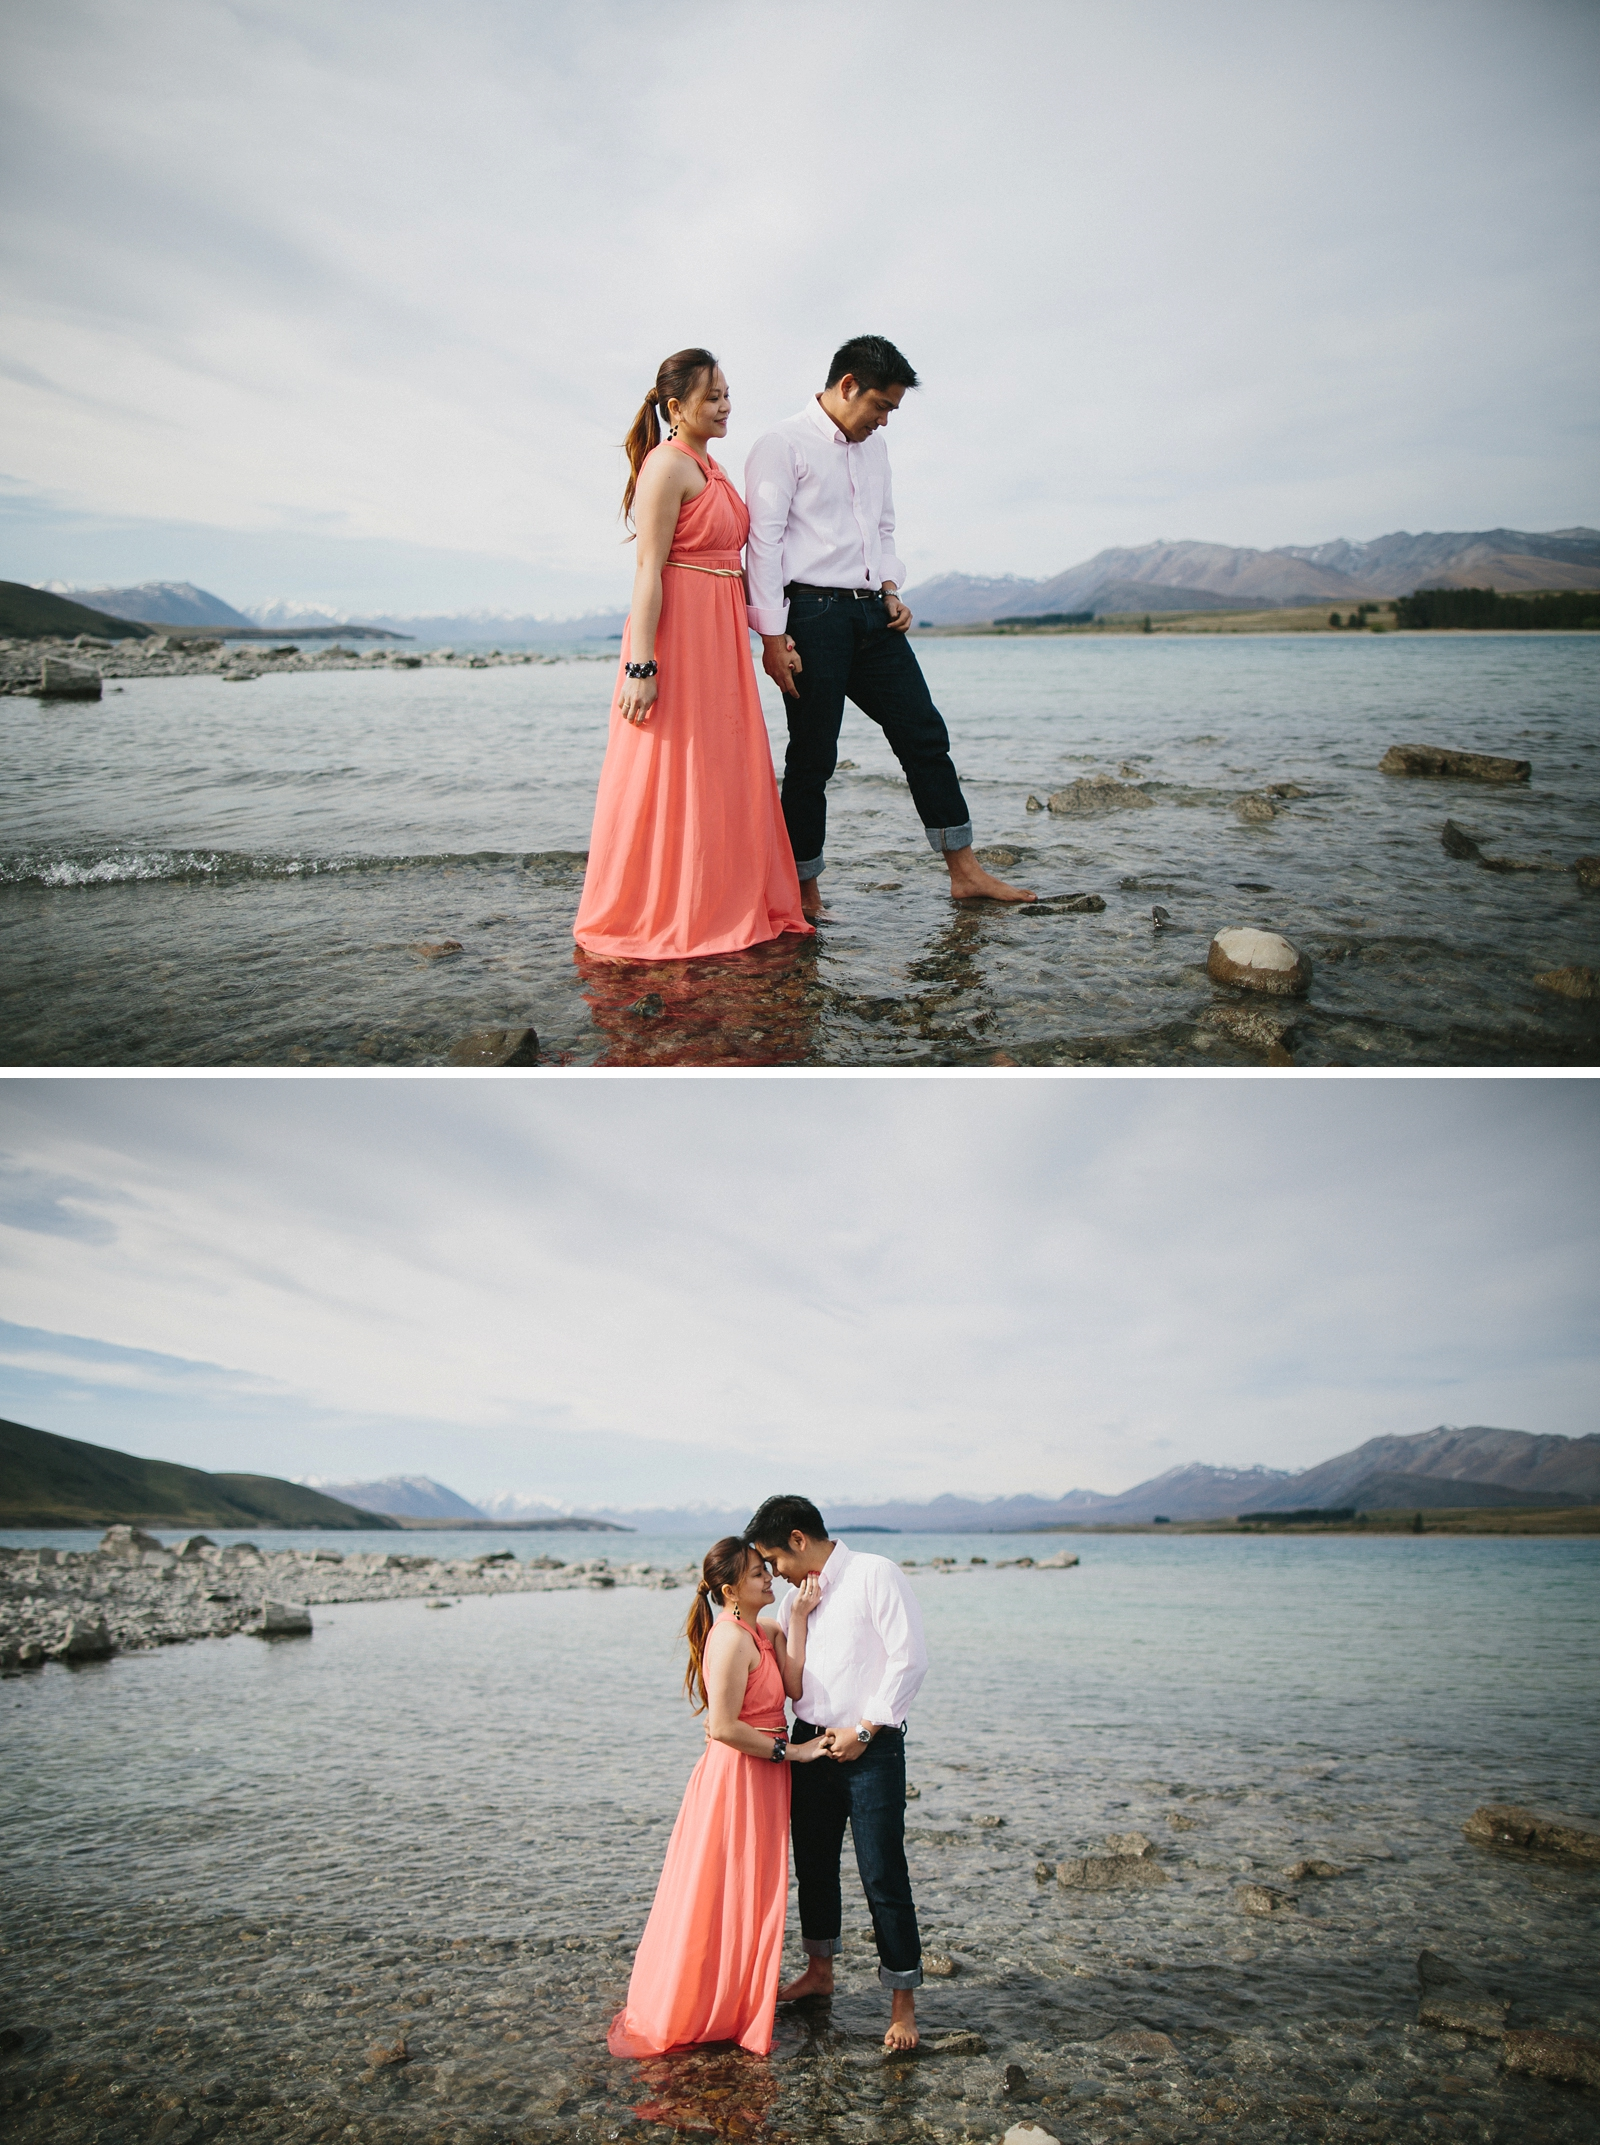 Chrirstchurch Engagement Photographer_Patty Lagera_0036.jpg